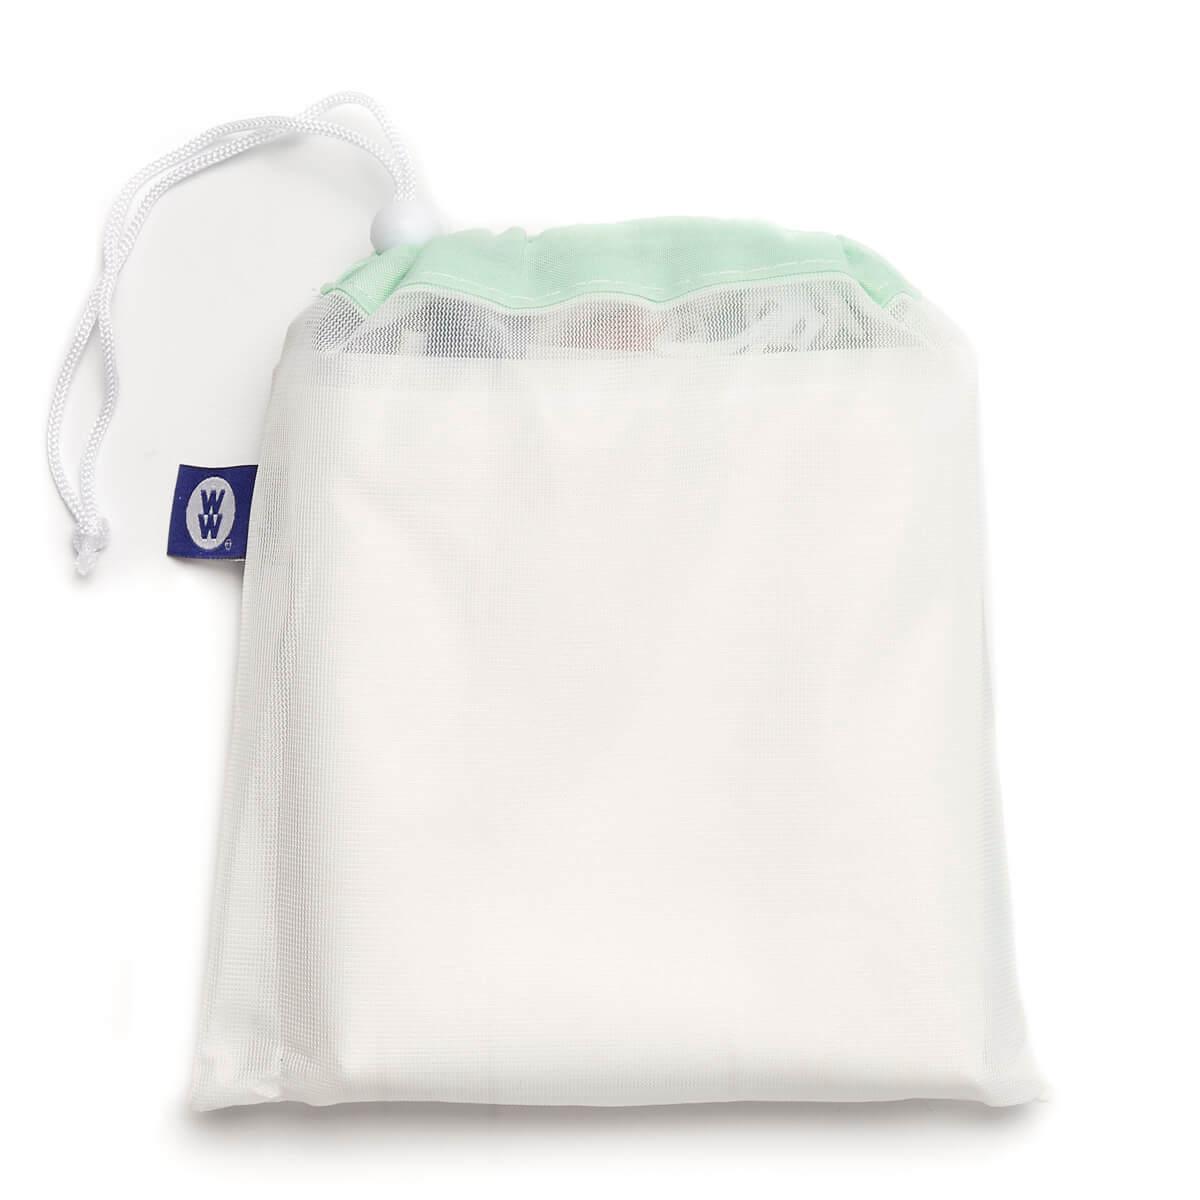 WW Reusable Produce Bags - storage